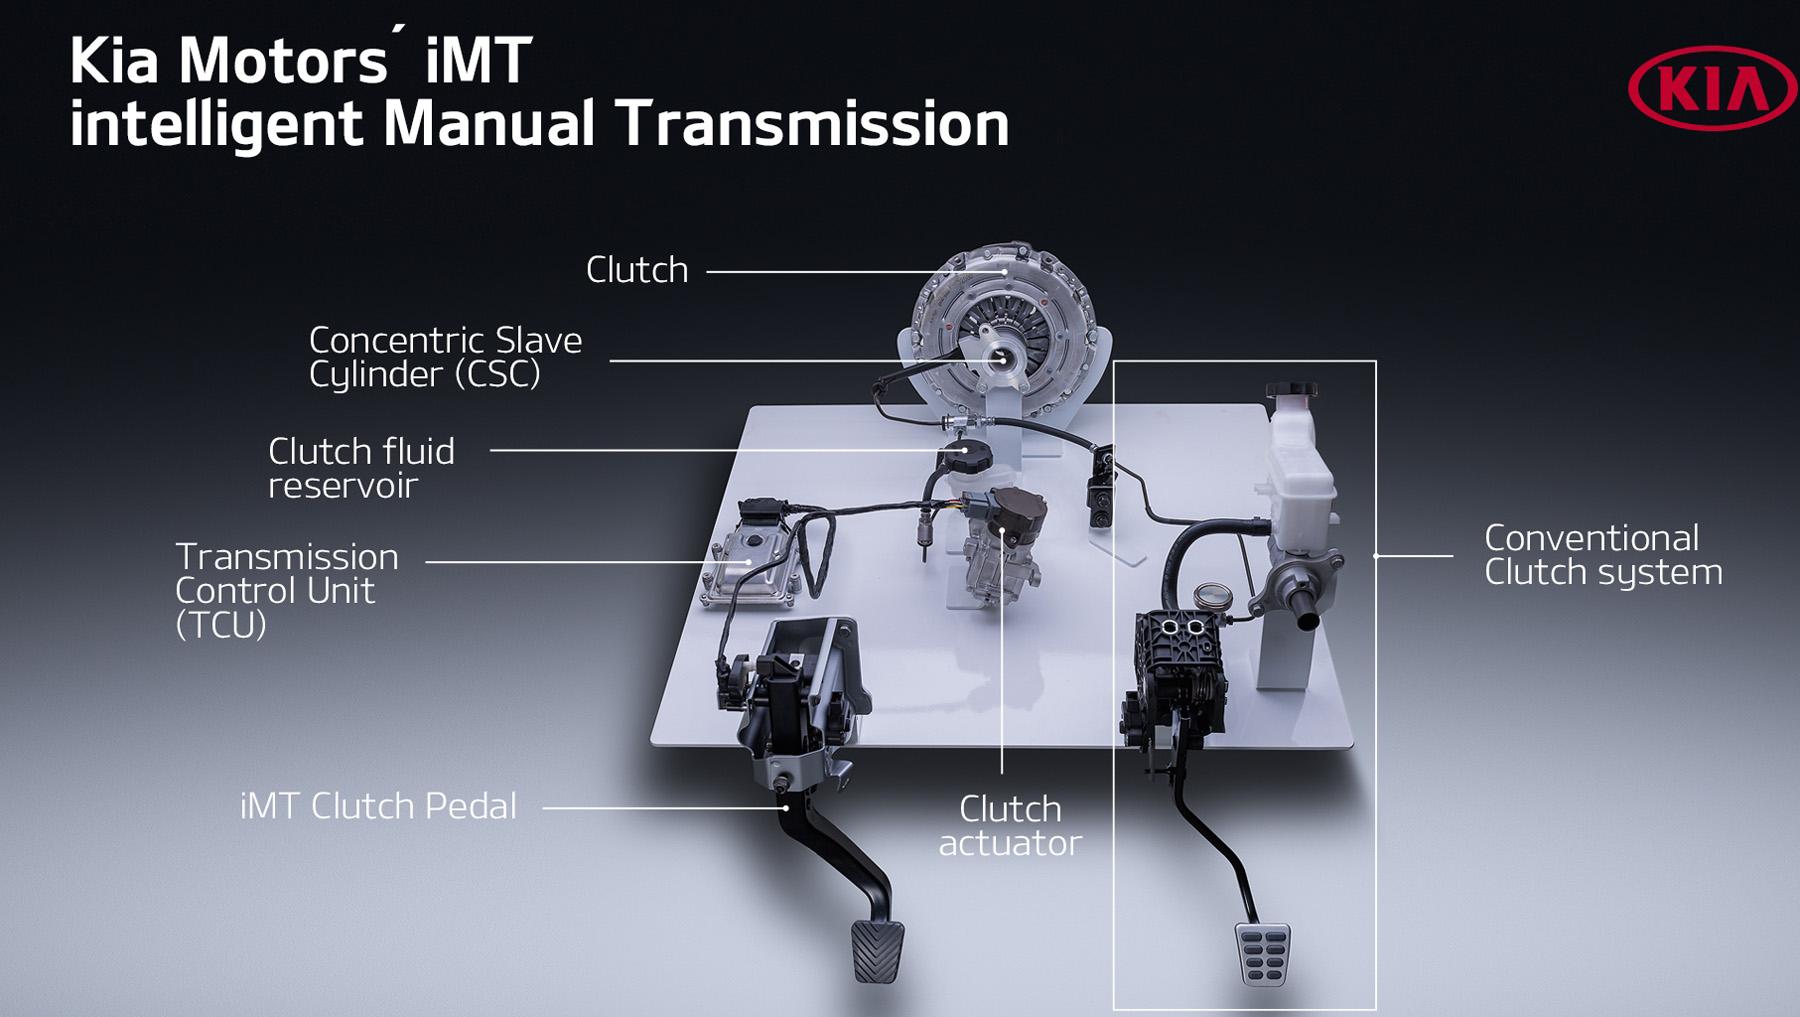 intelligent Manual Transmission